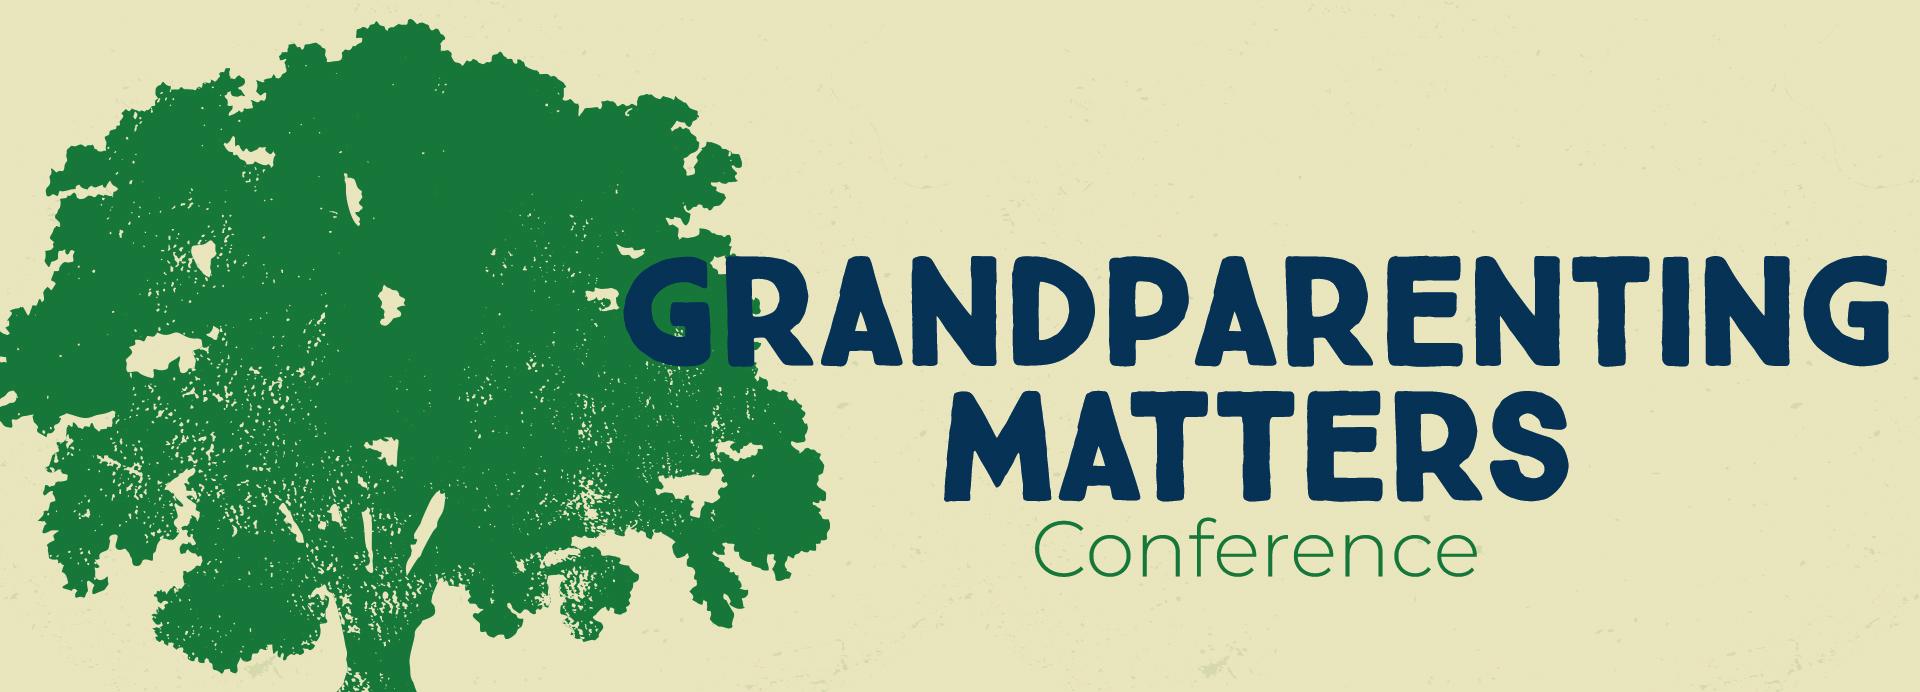 Grandparenting Matters_banner.jpg